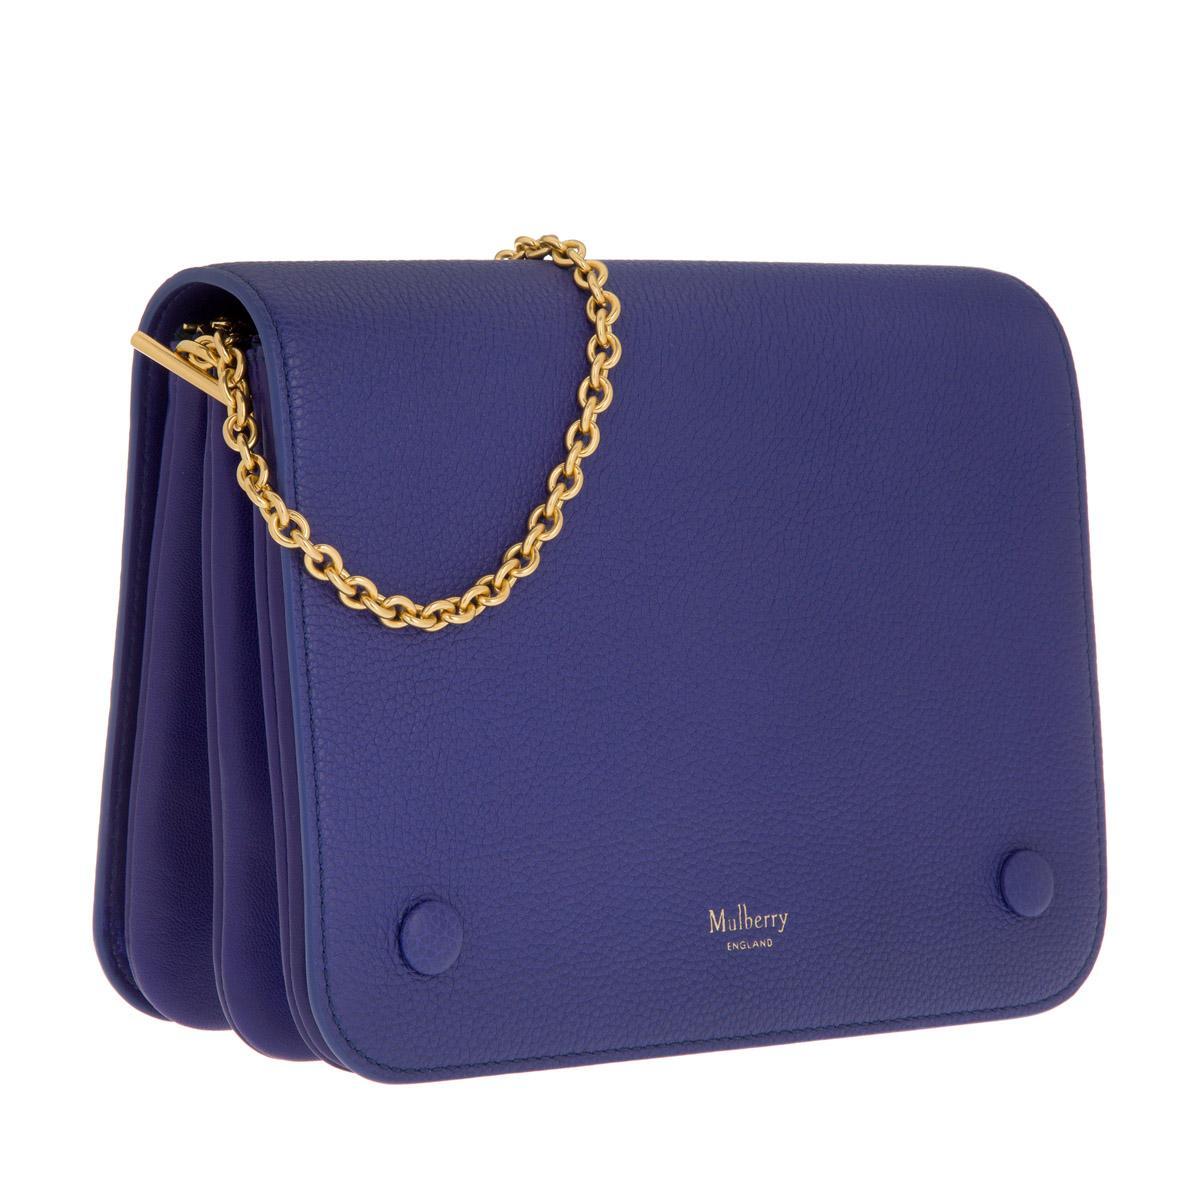 Mulberry Clifton Small Crossbody Bag Classic Grain Indigo in Blue - Lyst 9601fd016b524